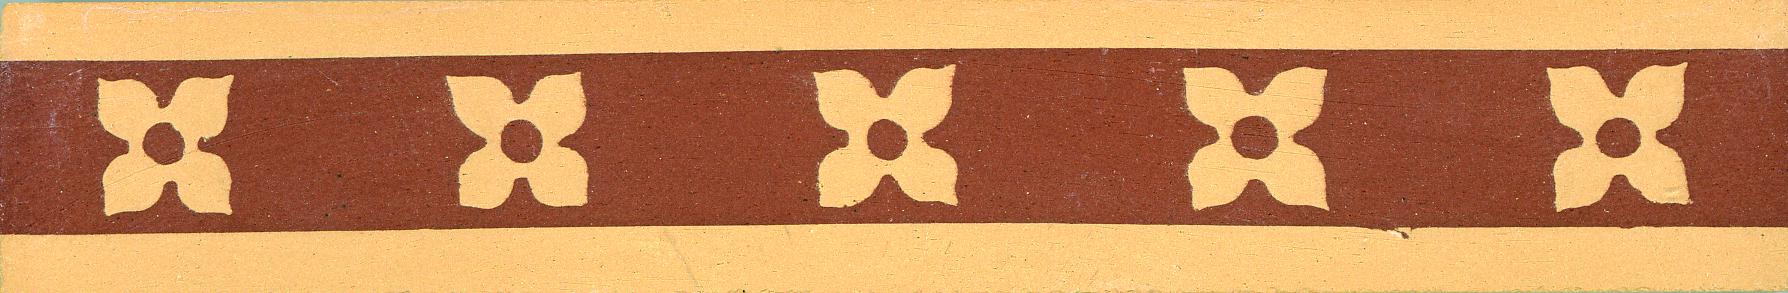 Encaustic Tile Border 125mm x 25mm B0001